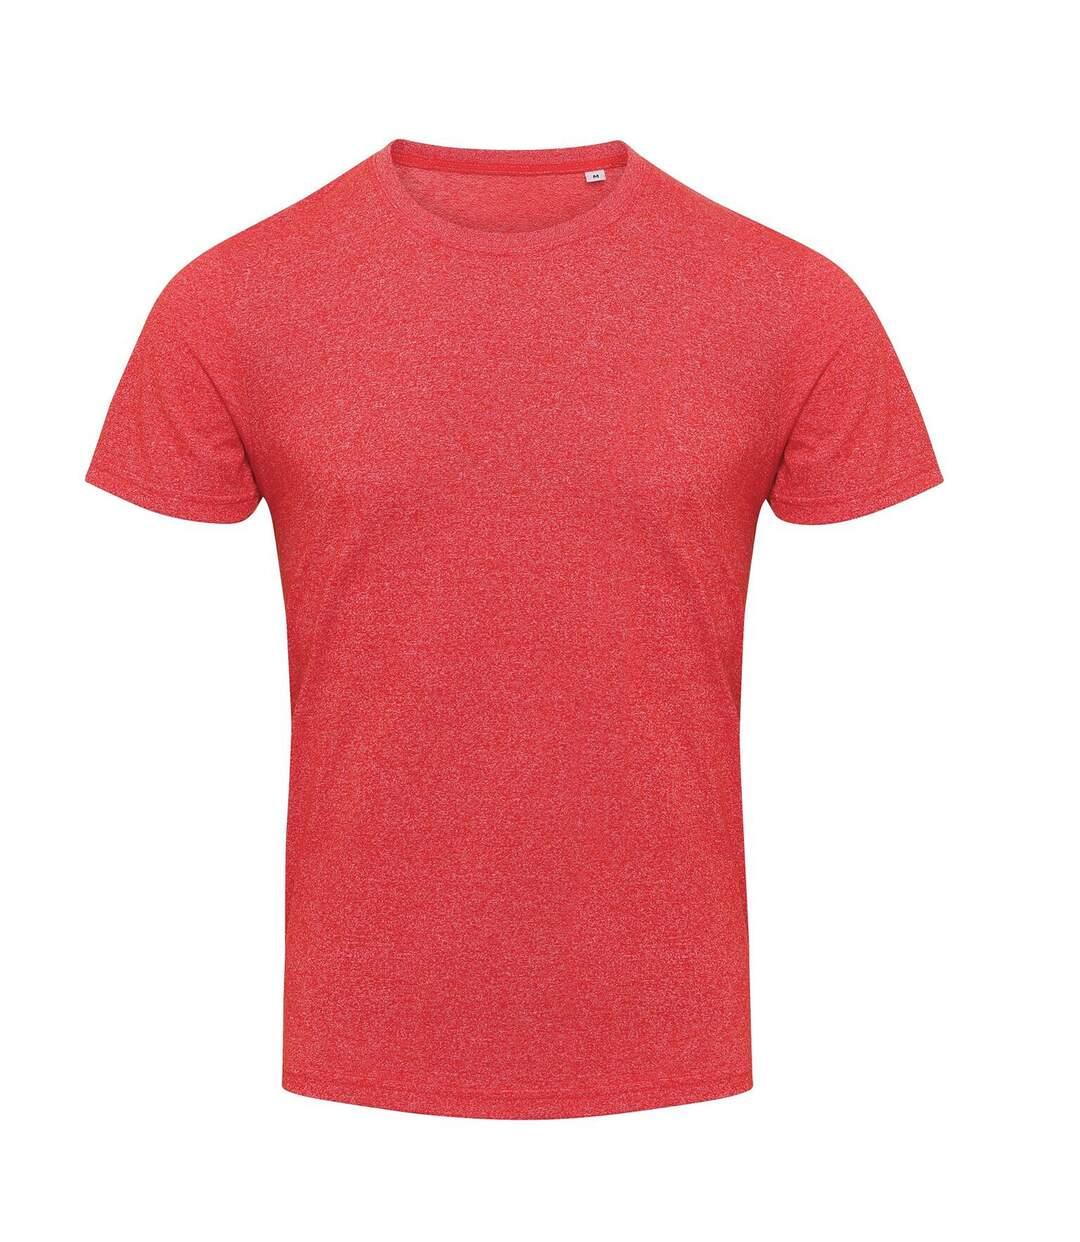 AWDis Mens Space Blend T Shirt (Space Red/White) - UTPC2897